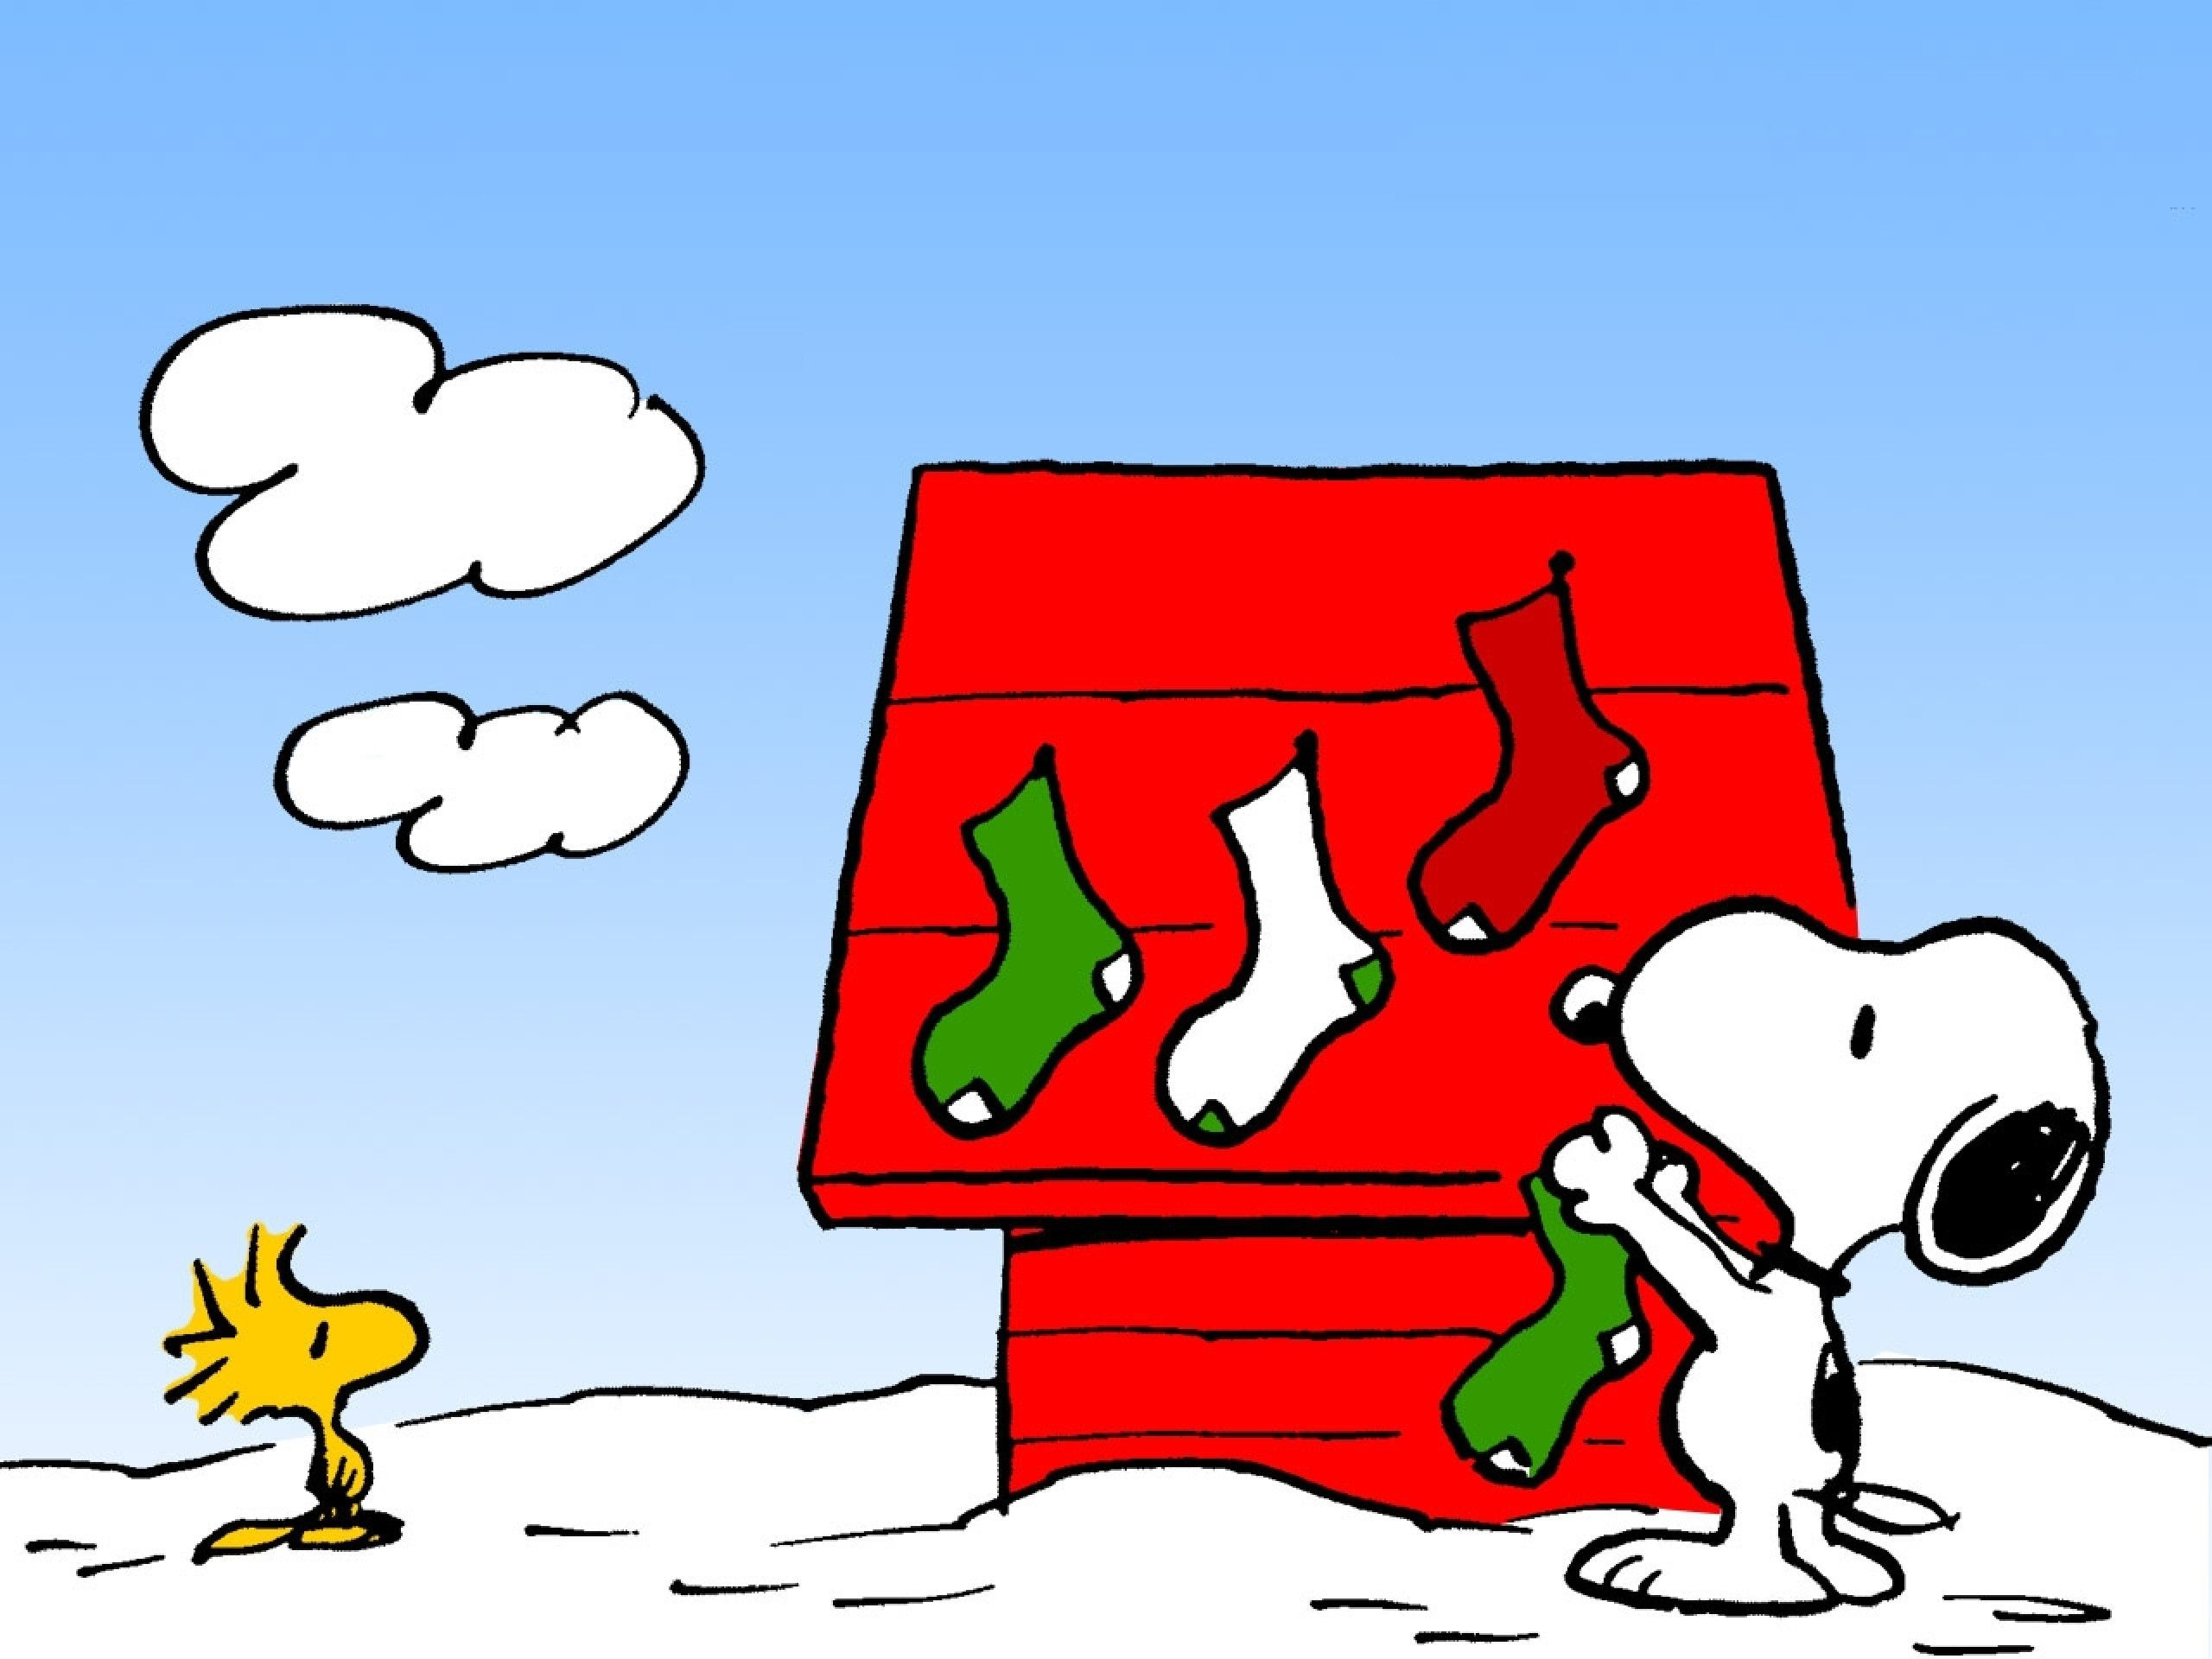 2560x1920 Charlie Brown Peanuts Comics Snoopy Christmas Rw Wallpaper .